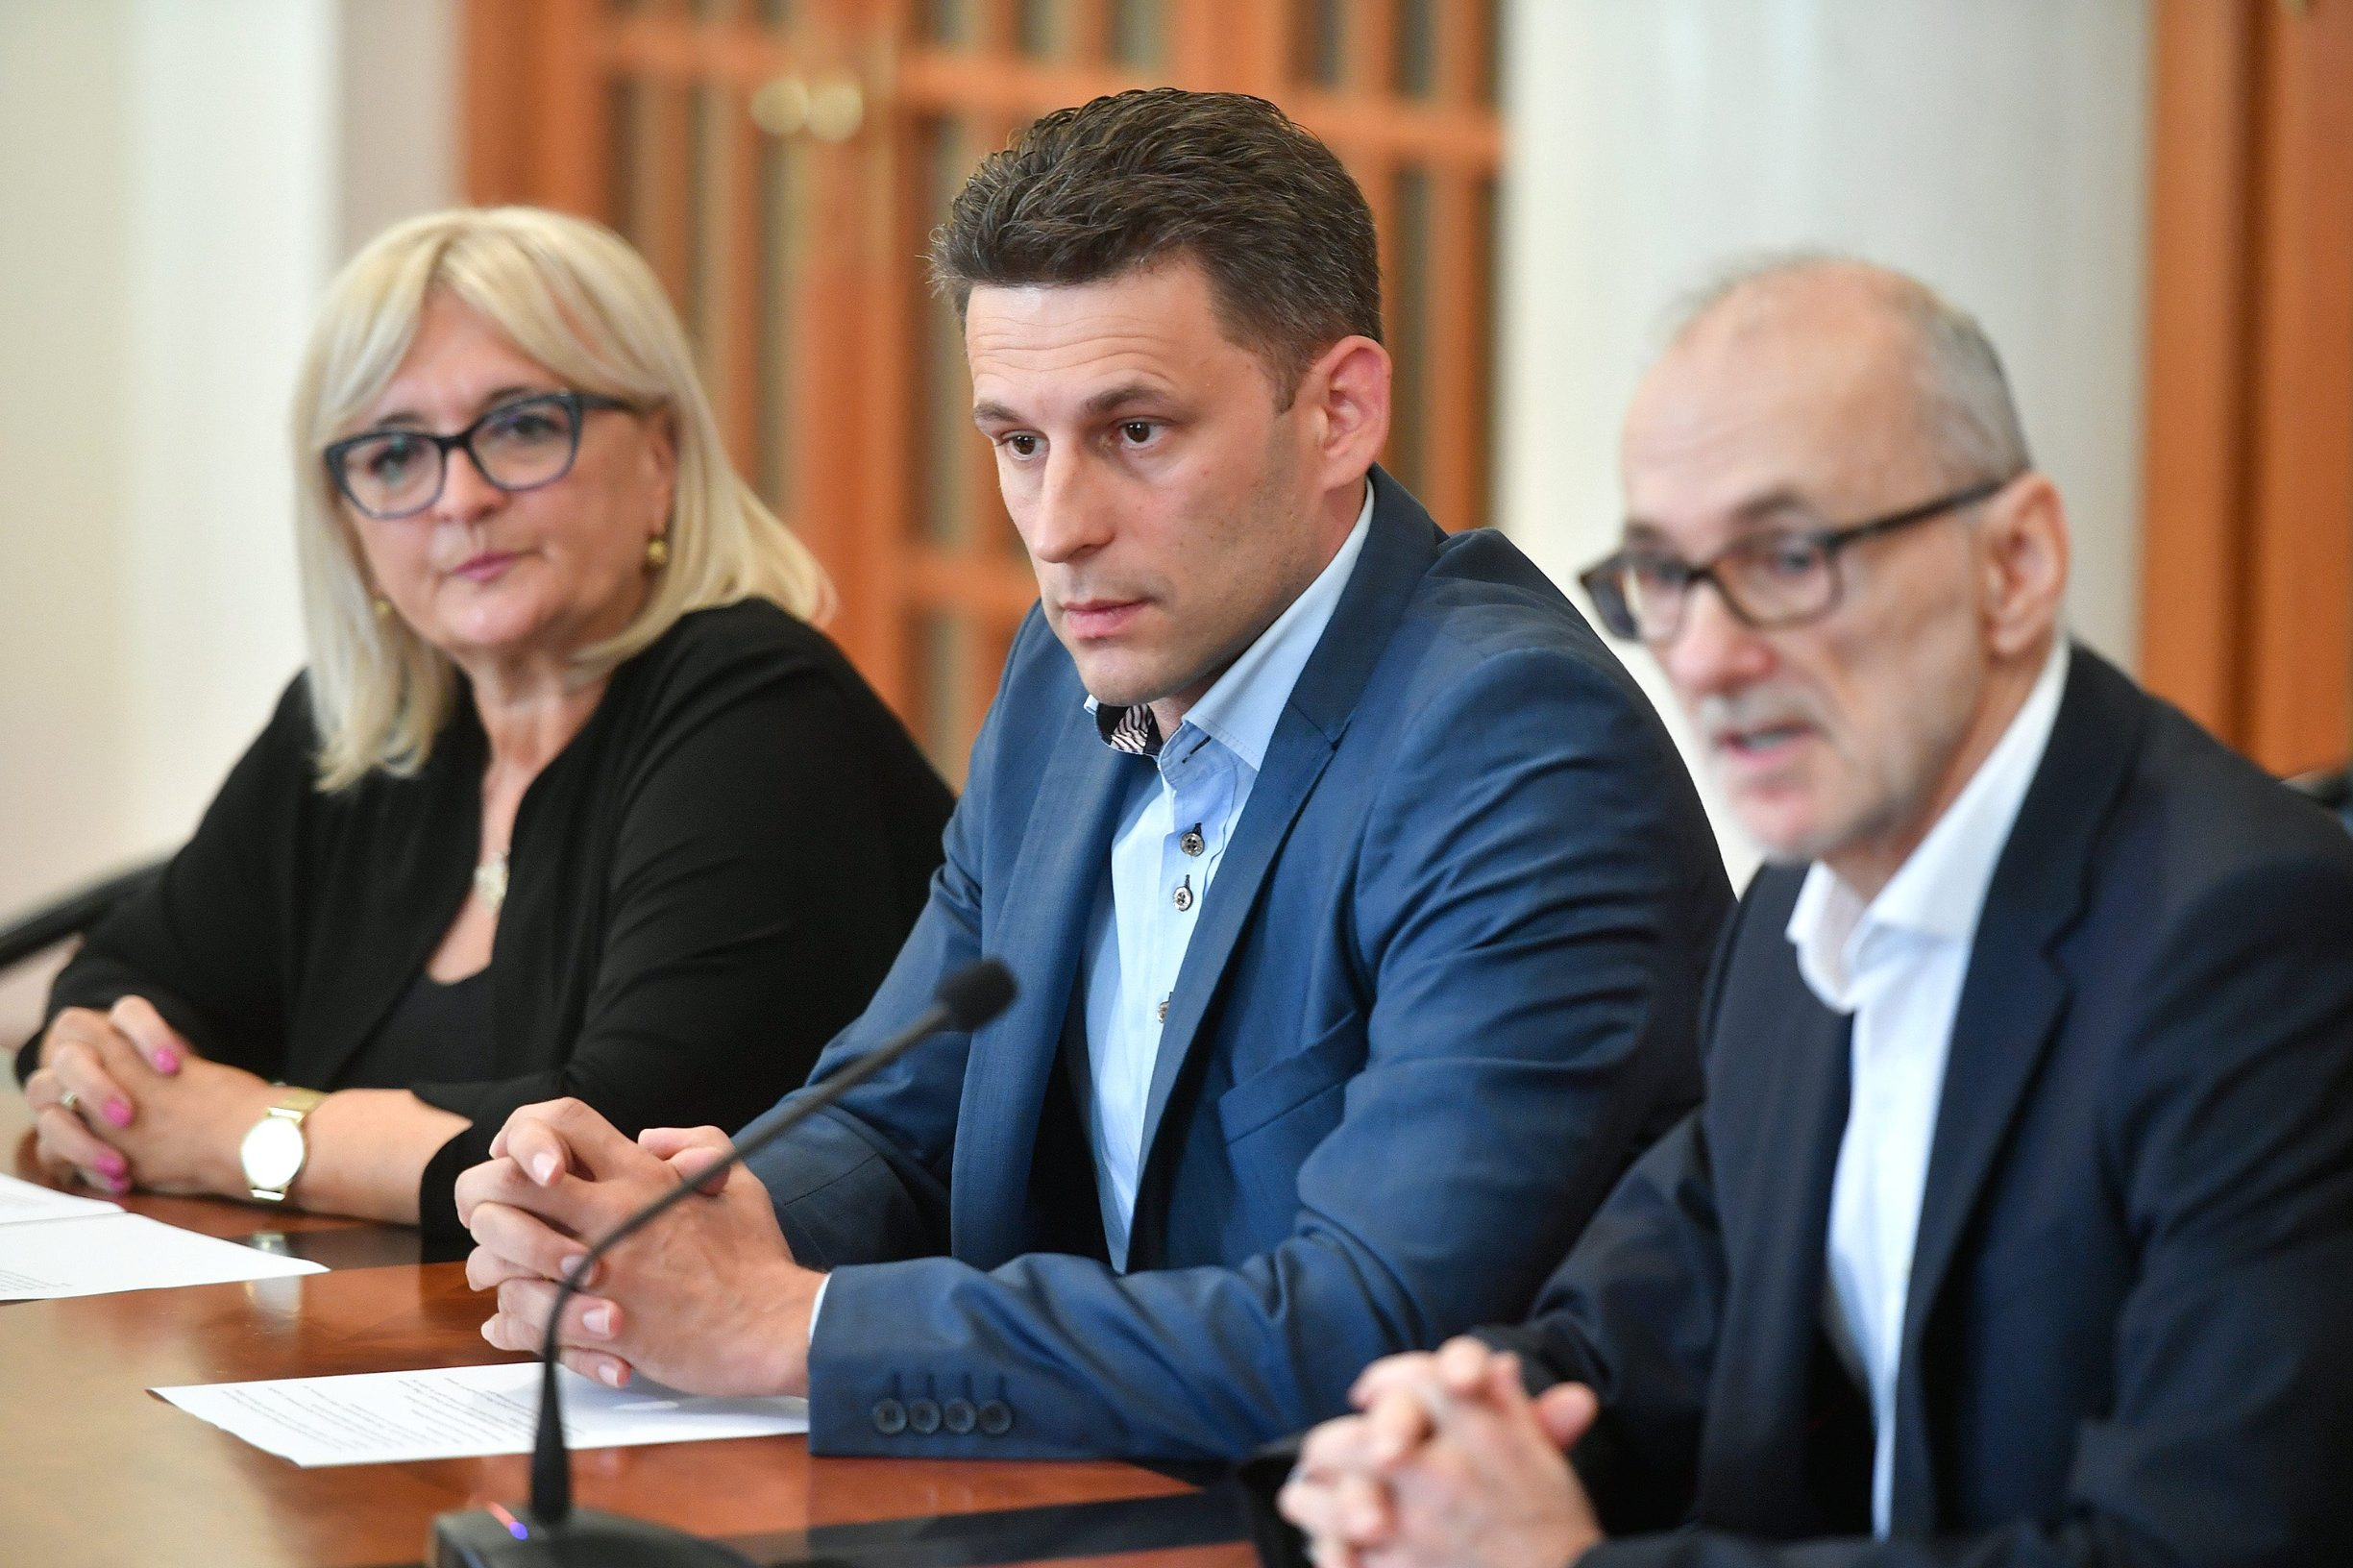 Ines Strenja Linić, Božo Petrov i Robert Podolnjak.